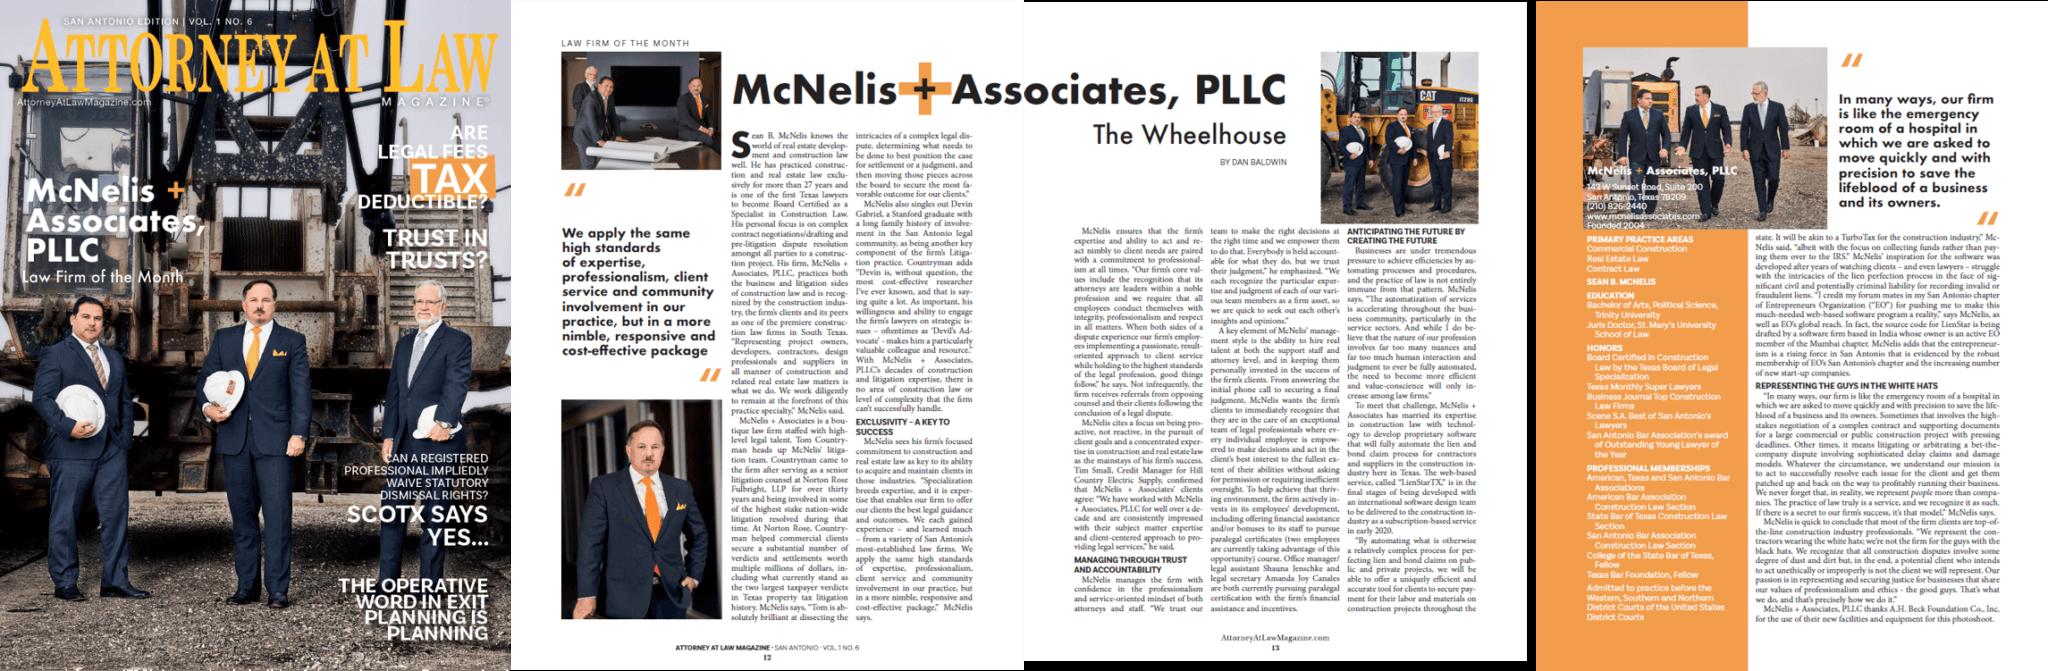 McNelis + Associates PLLC